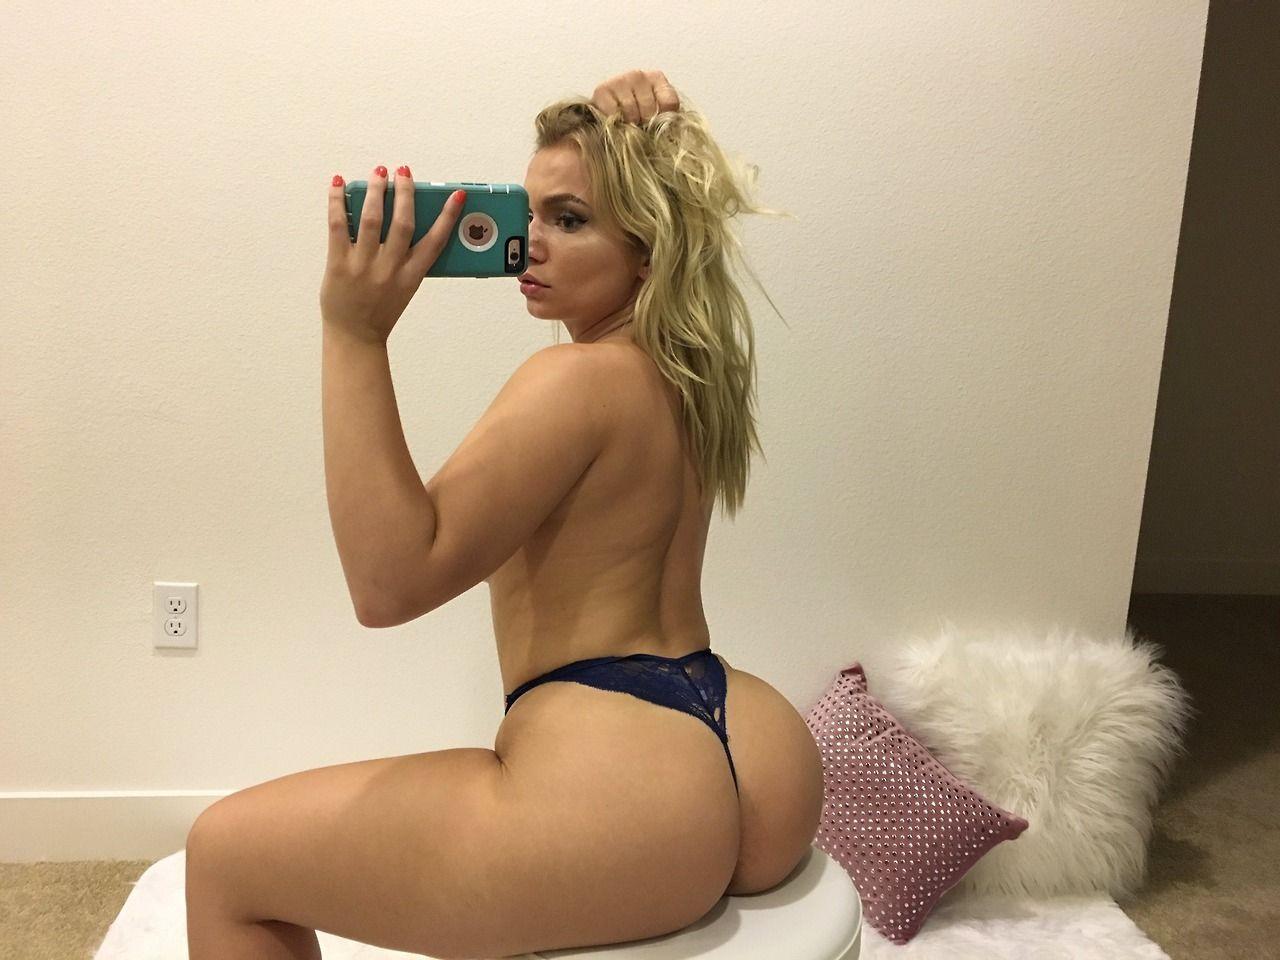 Selfie Zoie Burgher naked (73 foto and video), Ass, Hot, Selfie, legs 2019